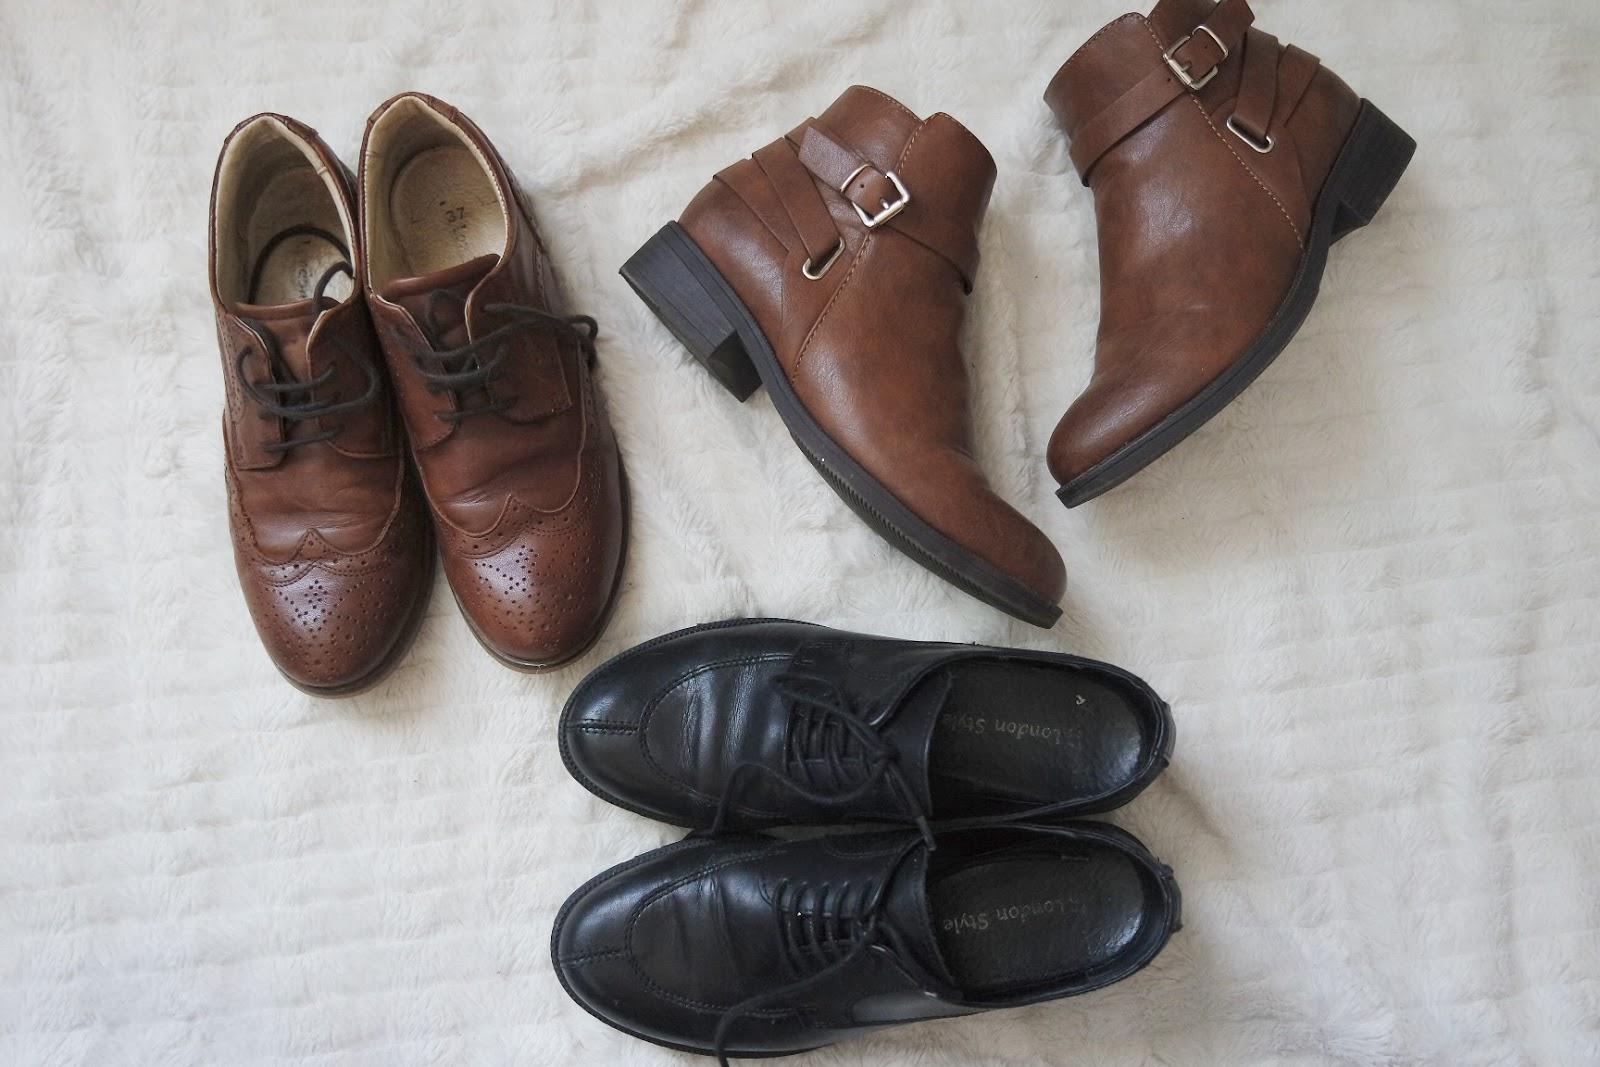 Chaussures Derbies Bessons Bottine Pitta Rosso Look Automne Blog Coin des licornes littéraire lifestyle Toulouse